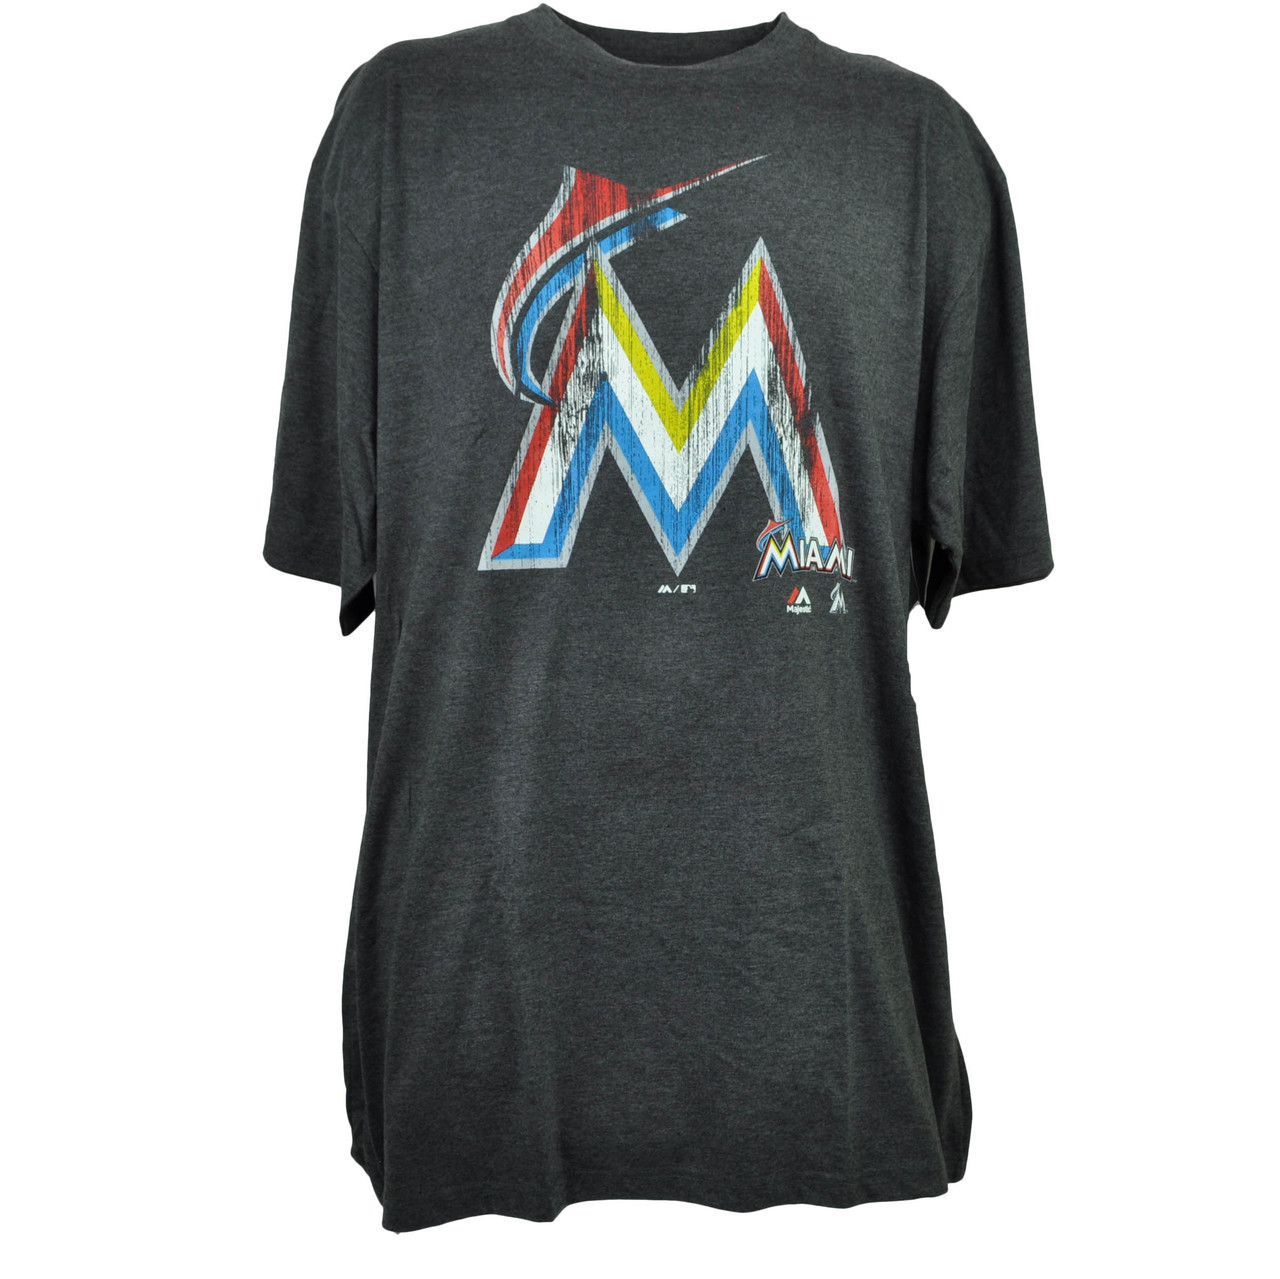 85f7e72ff0f MLB Majestic Miami Marlins Gray Mens Adult Tshirt Tee Big Tall ...